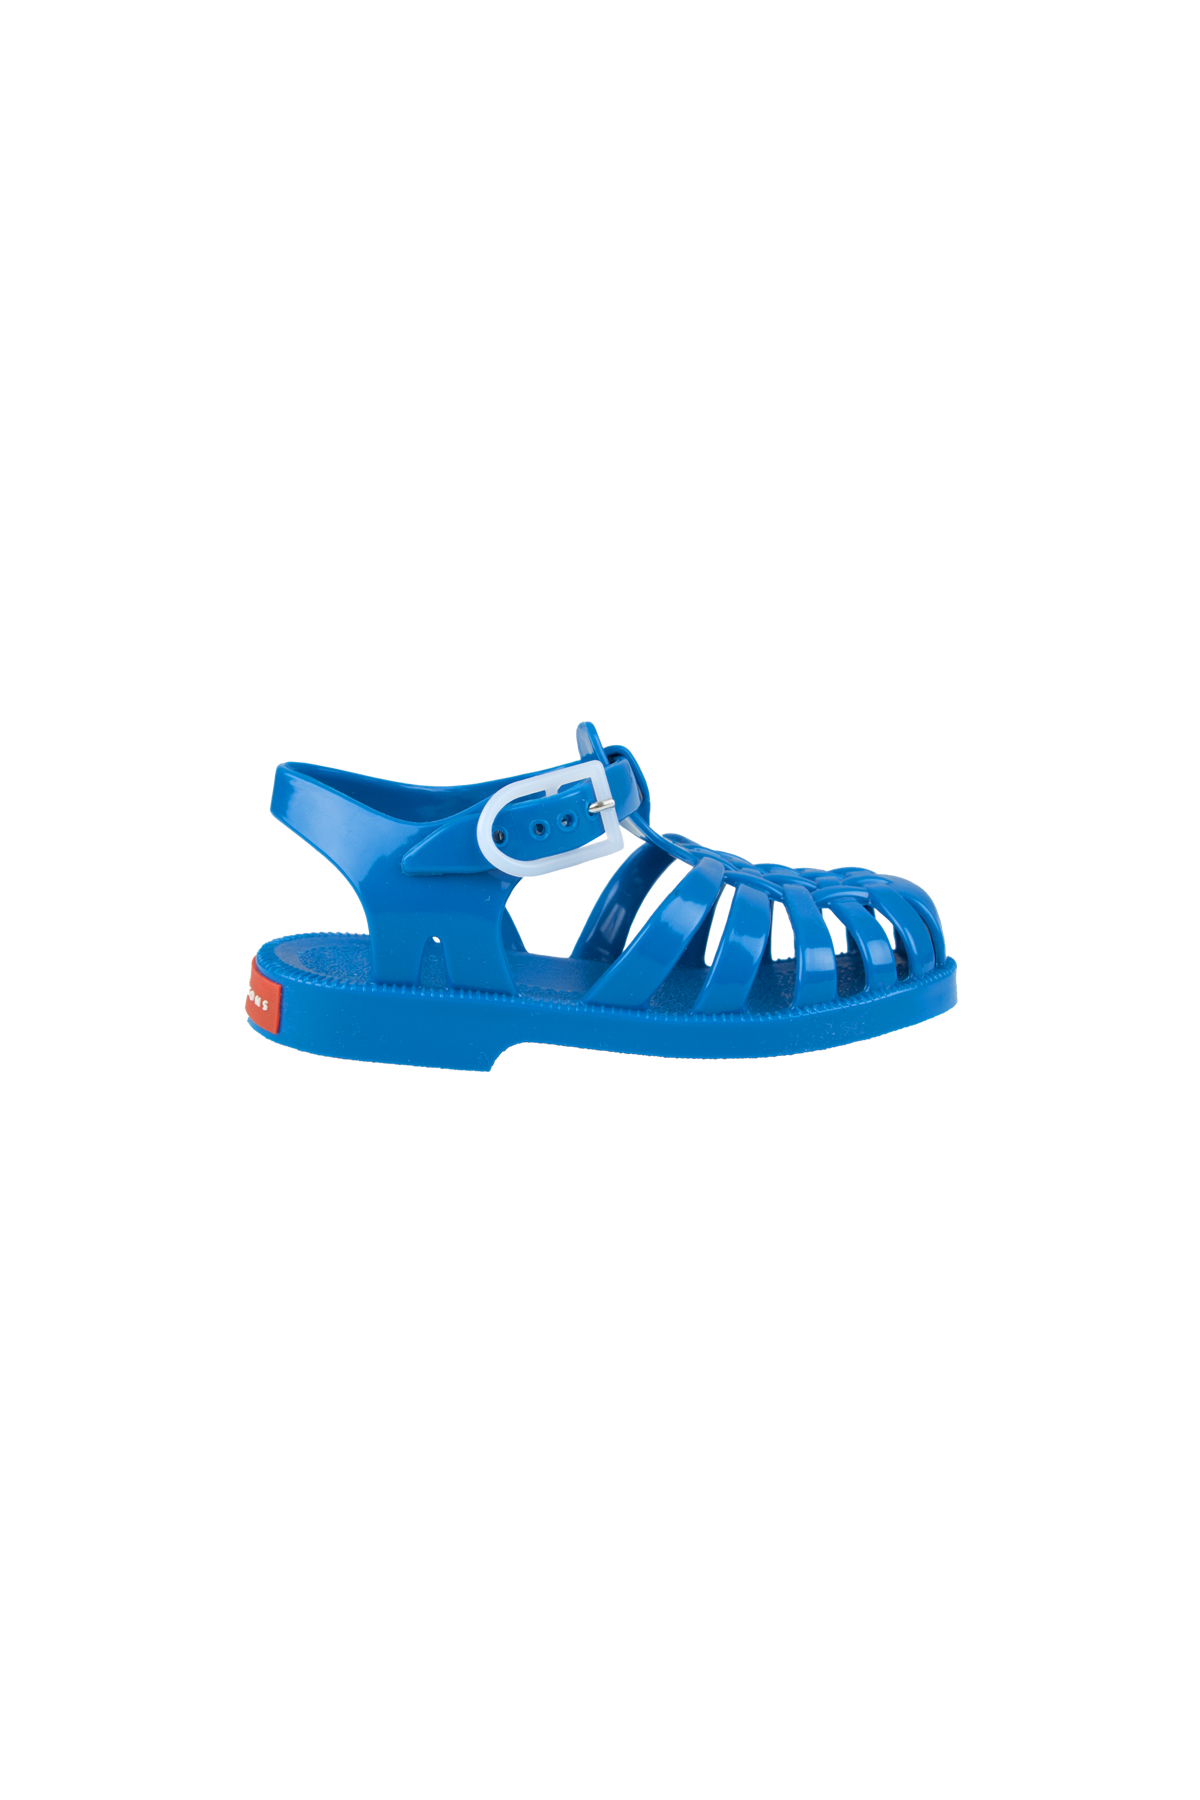 Sandali Ragnetto Bambino Gomma Jelly Blu Tinycottons